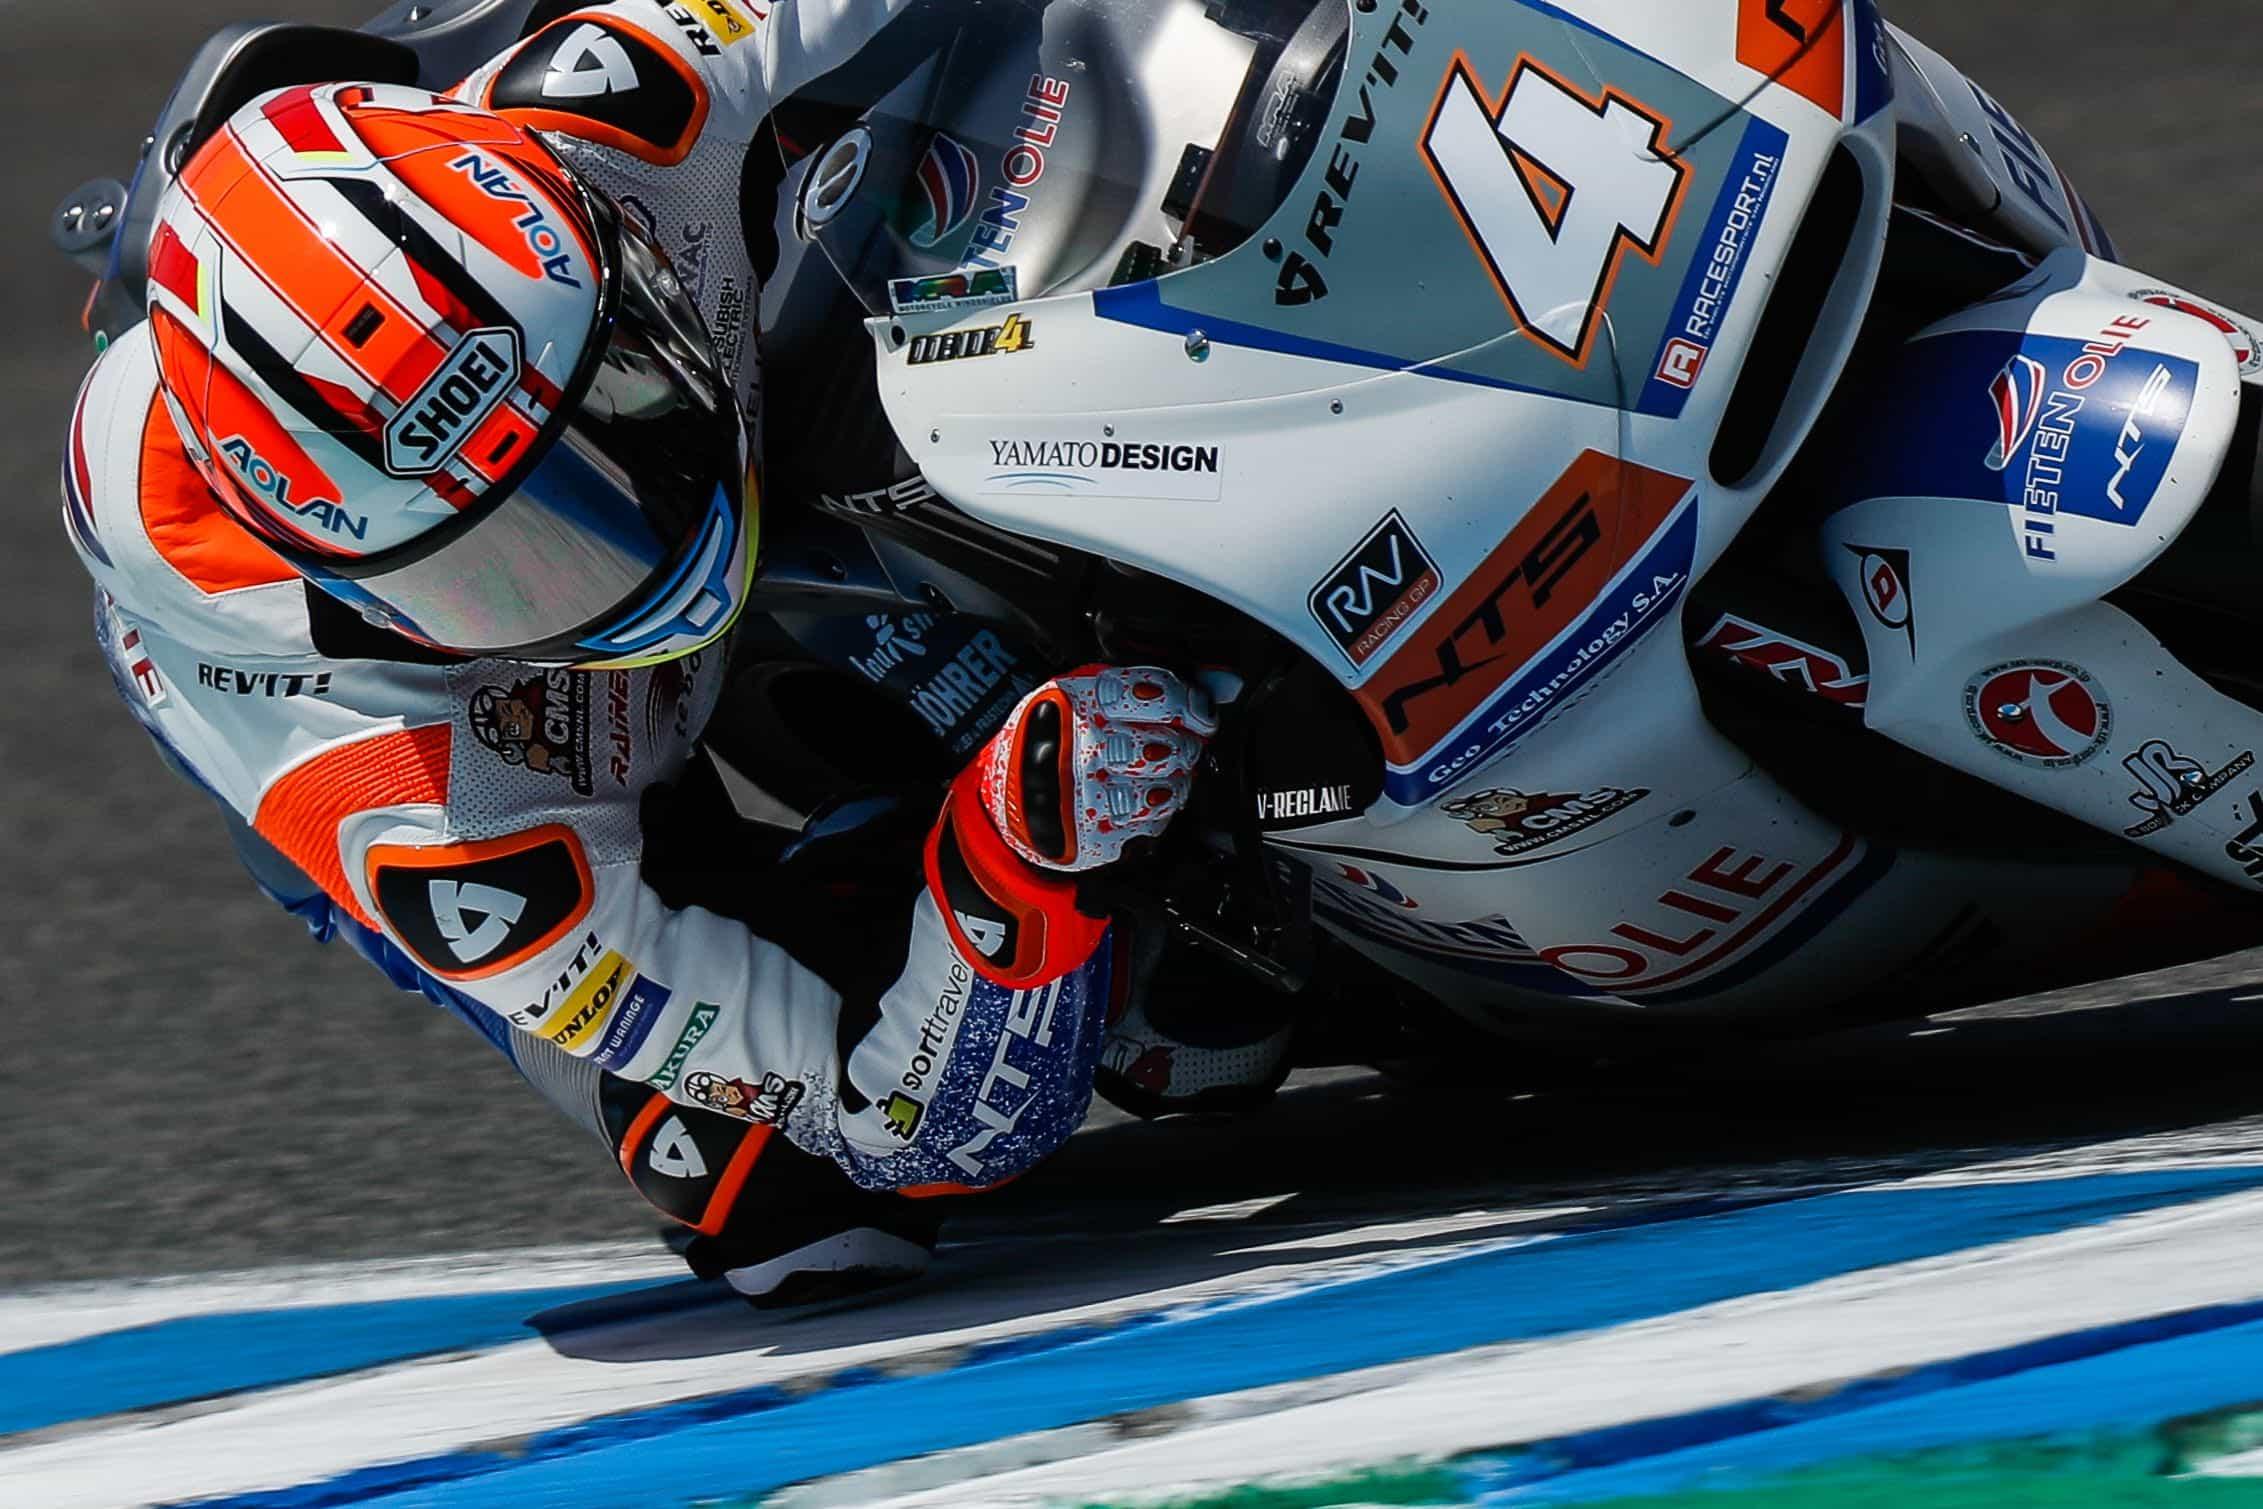 NTS RW Racing GP ヘレスGP公式練習3、公式予選(土曜日)レポート